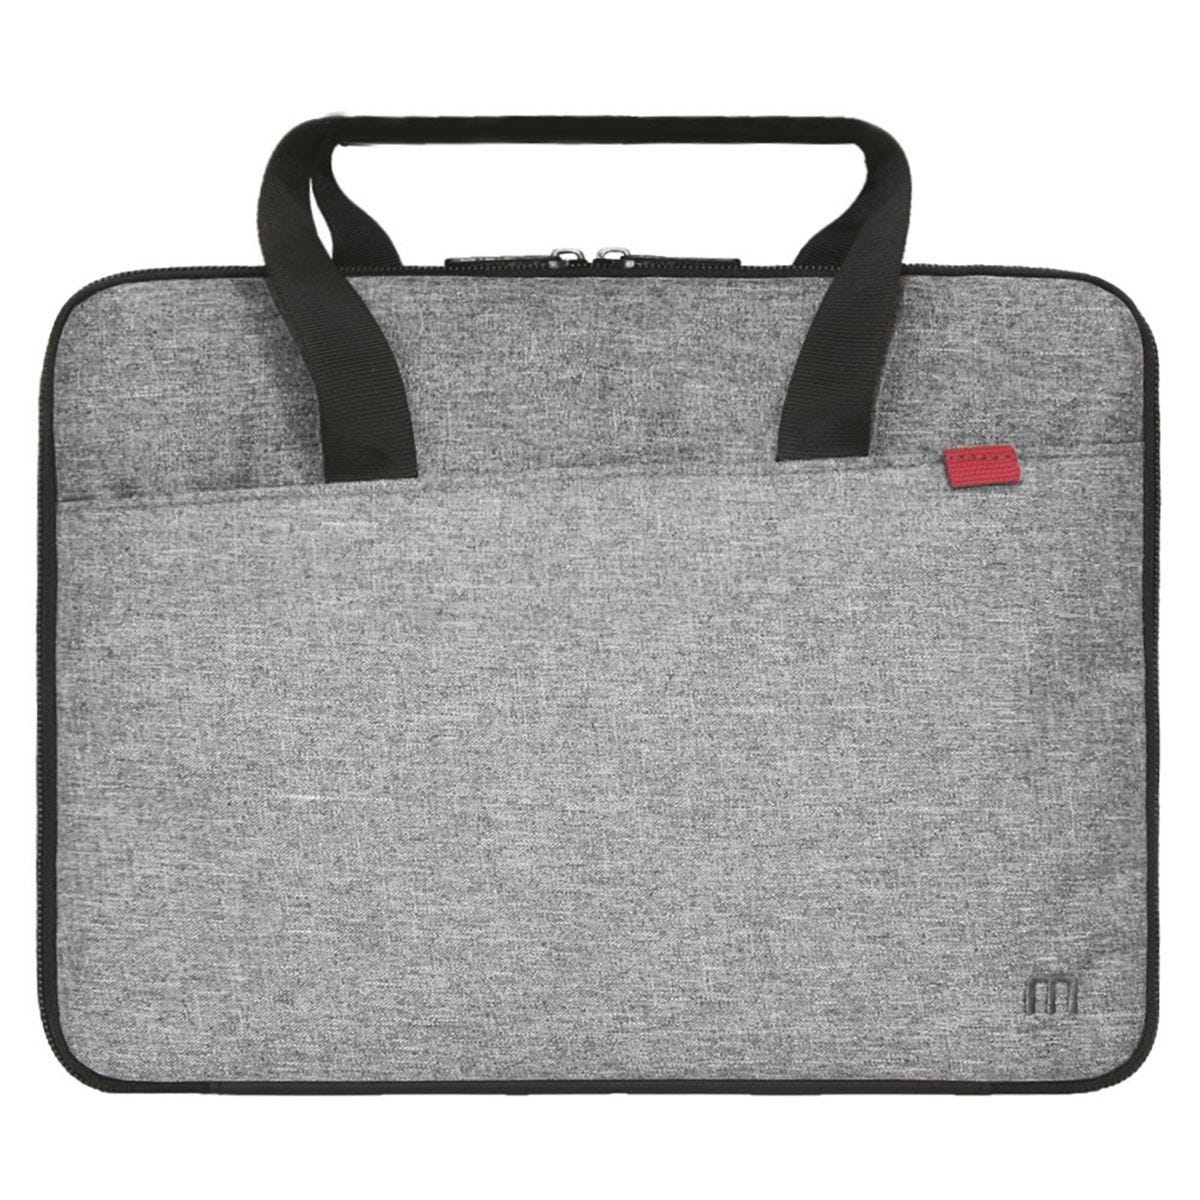 Mobilis Trendy 12.5-14'' Laptop Sleeve - Grey